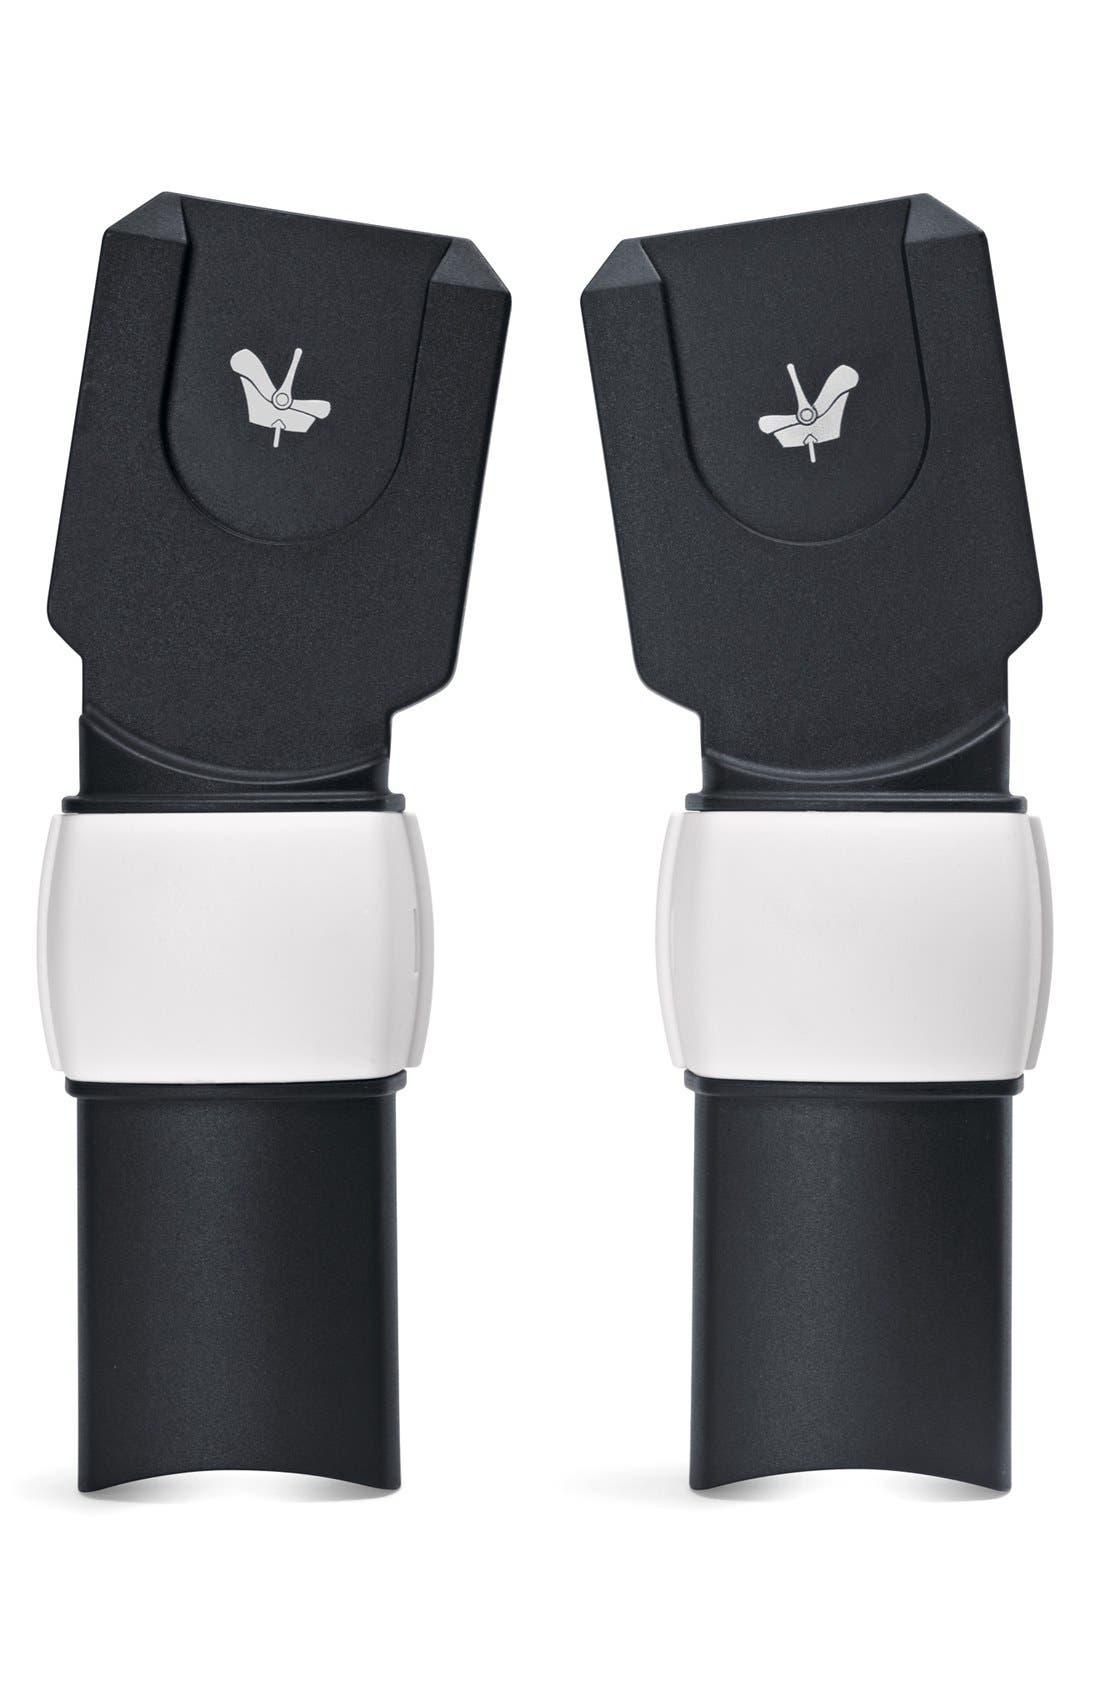 Bugaboo 'Buffalo' Maxi Cosi Car Seat Adaptors